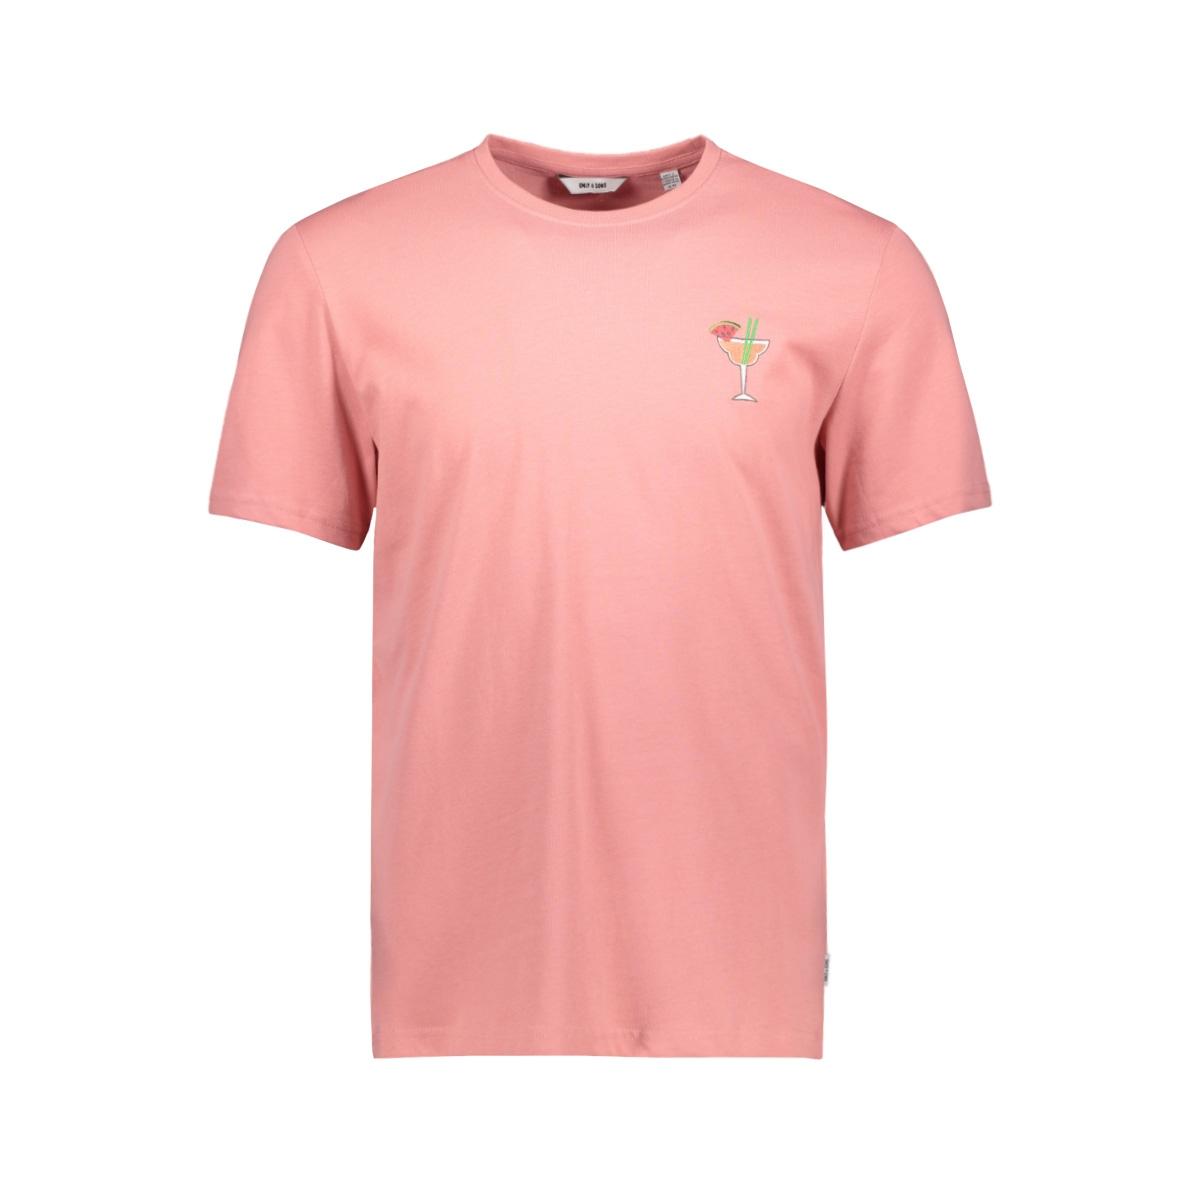 onskobi reg ss tee 22016072 only & sons t-shirt mauveglow